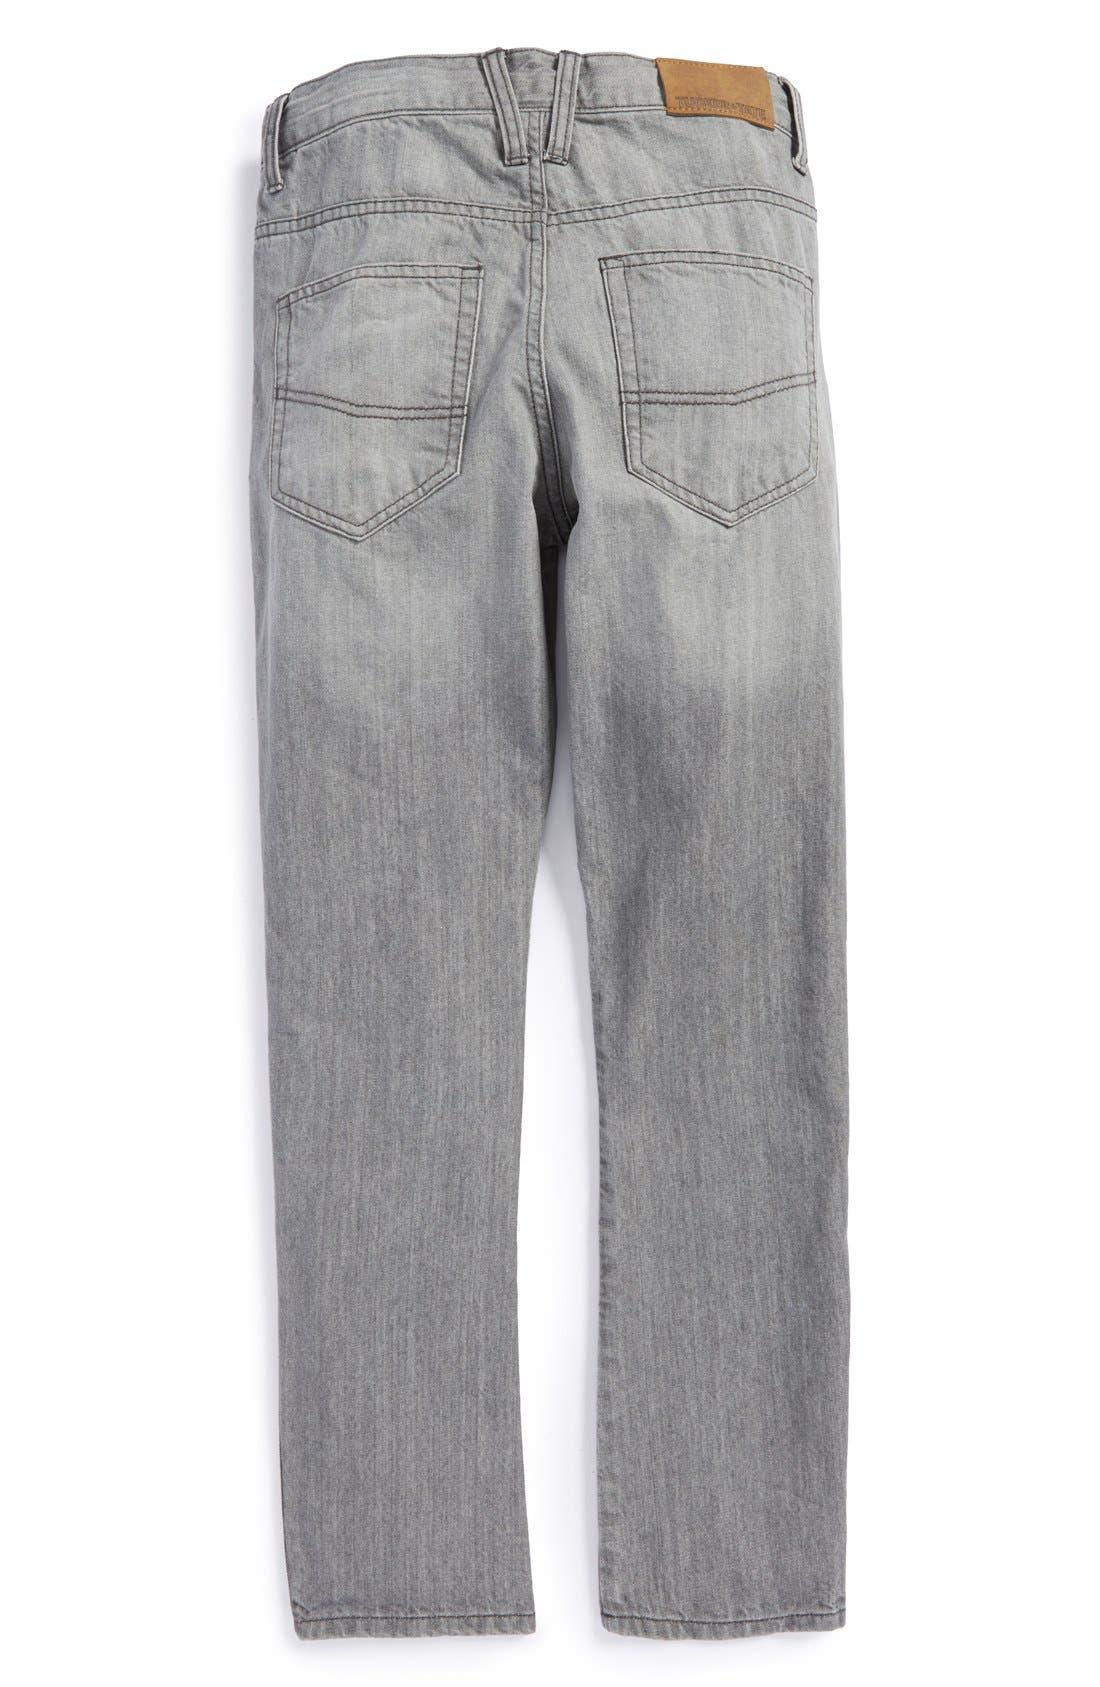 Main Image - Tucker + Tate 'Rocco' Skinny Jeans (Big Boys)